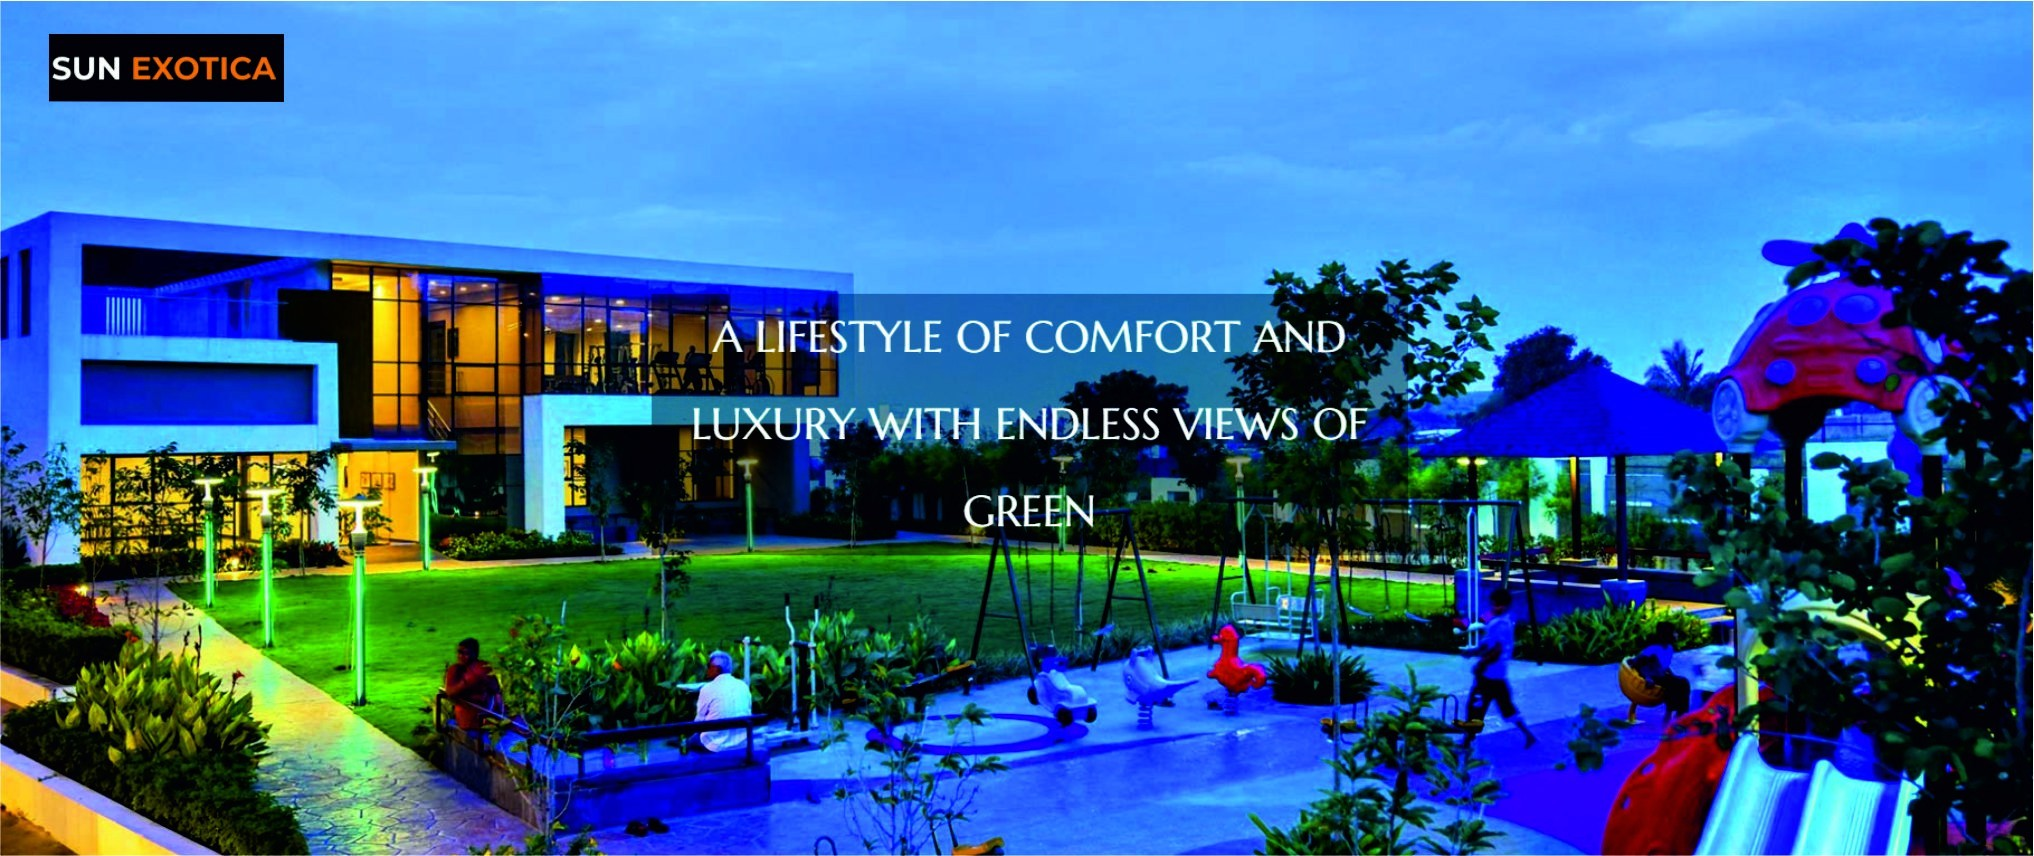 2 & 3 BHK Apartments in Katraj Kondhwa Road | Sun Exotica | Mittalbuilders